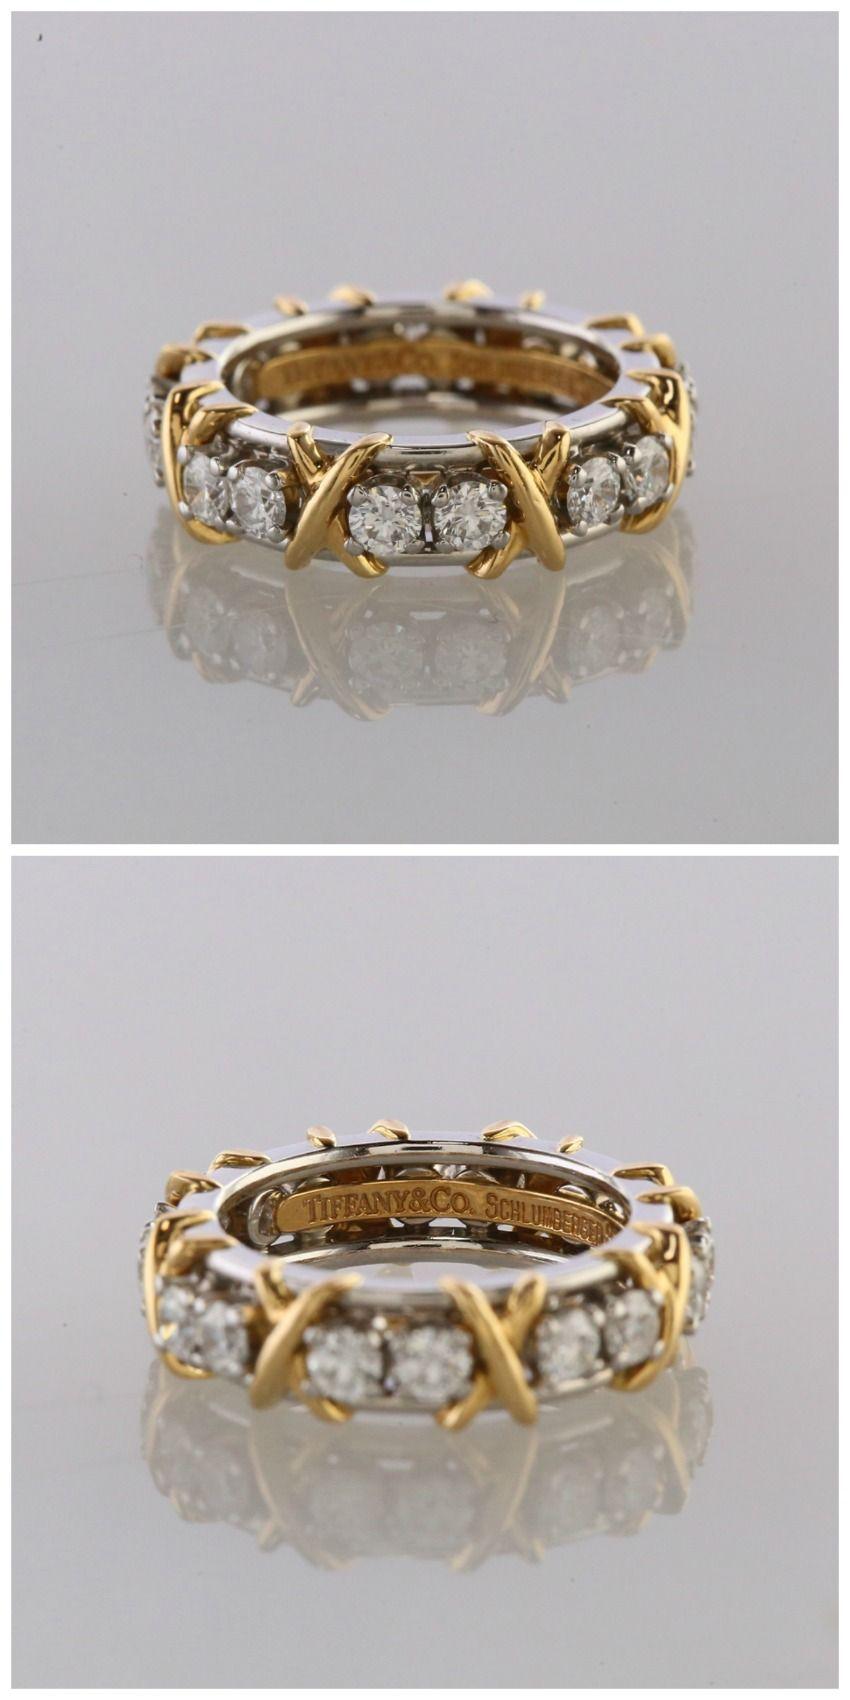 Tiffany & Co. Schlumberger Sixteen Stone Diamond Ring